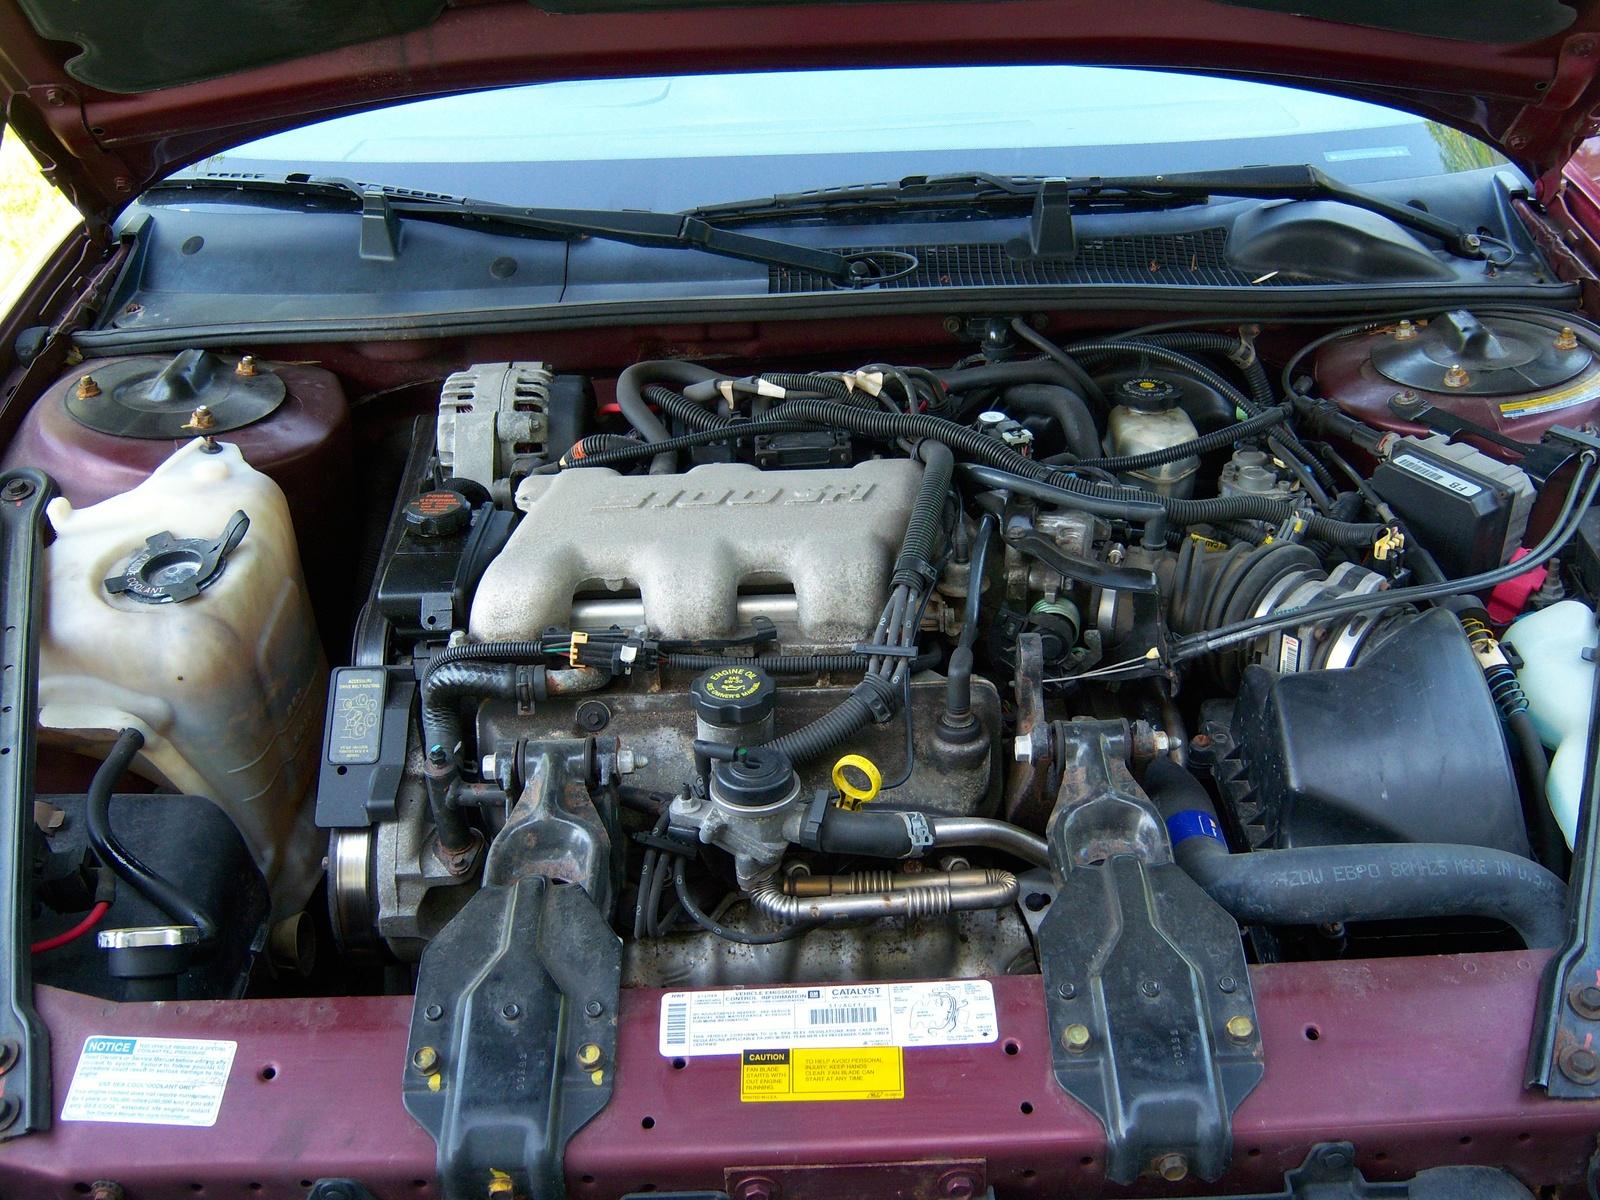 Picture of 2001 Chevrolet Lumina 4 Dr STD Sedan, engine